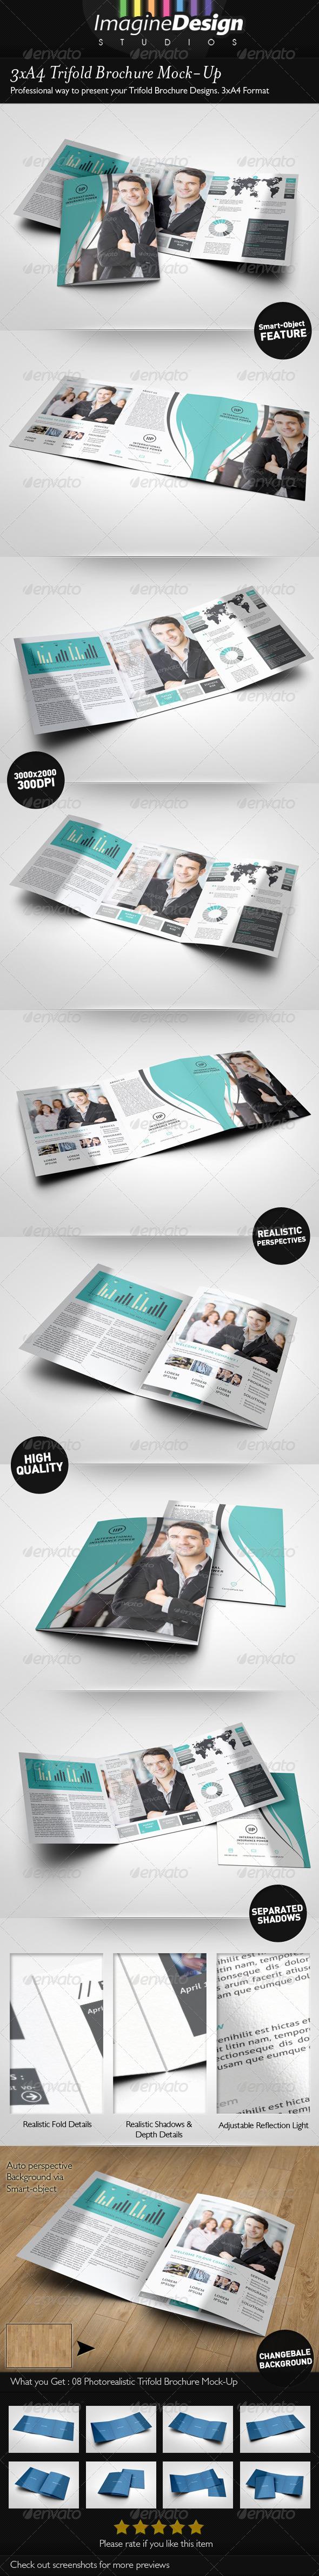 GraphicRiver 3xA4 Trifold Brochure Mock-Up 6693344